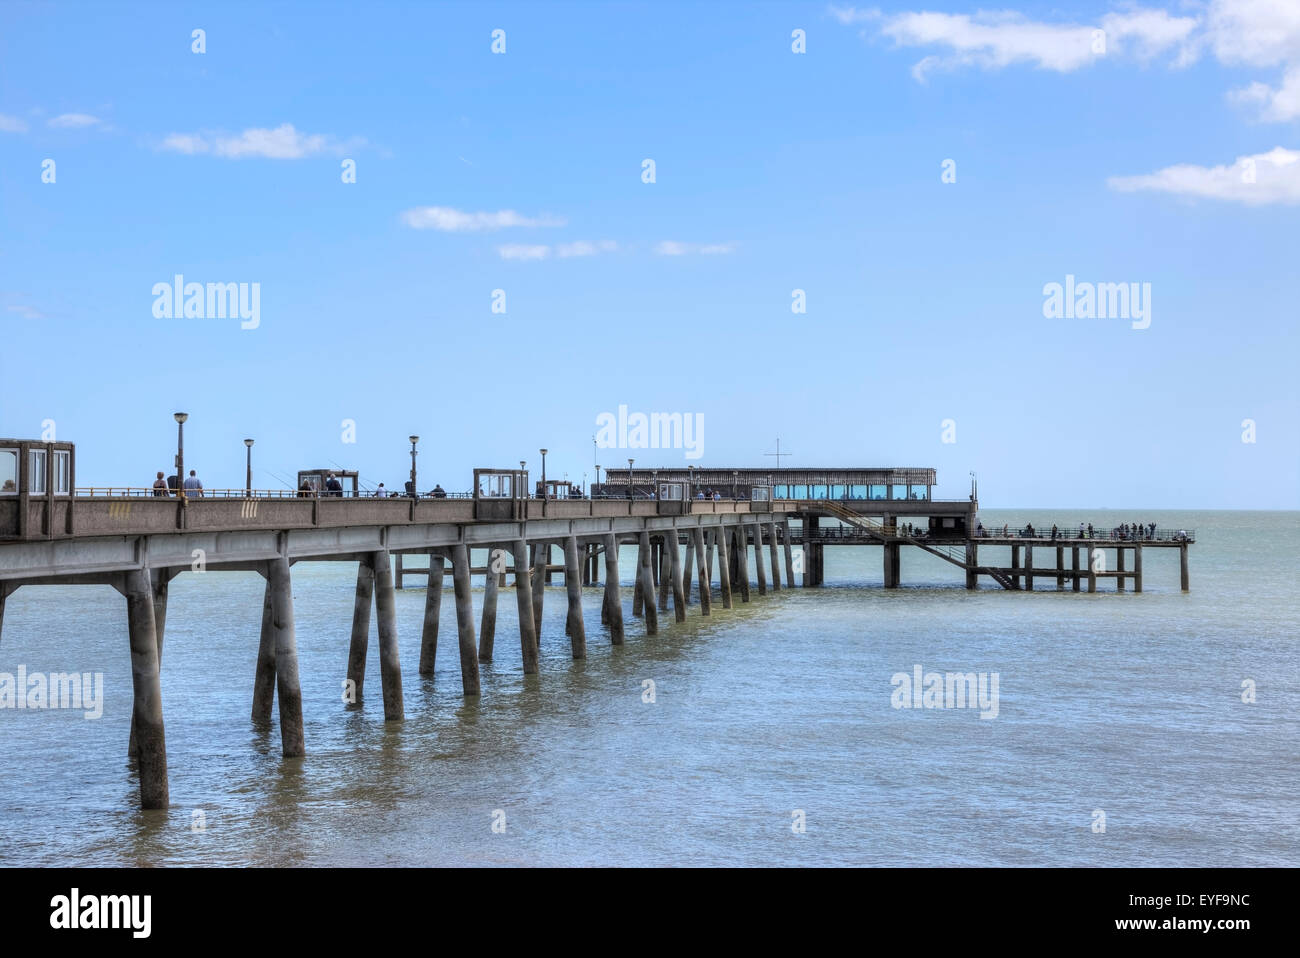 Deal Pier, Deal, Kent, England, United Kingdom - Stock Image